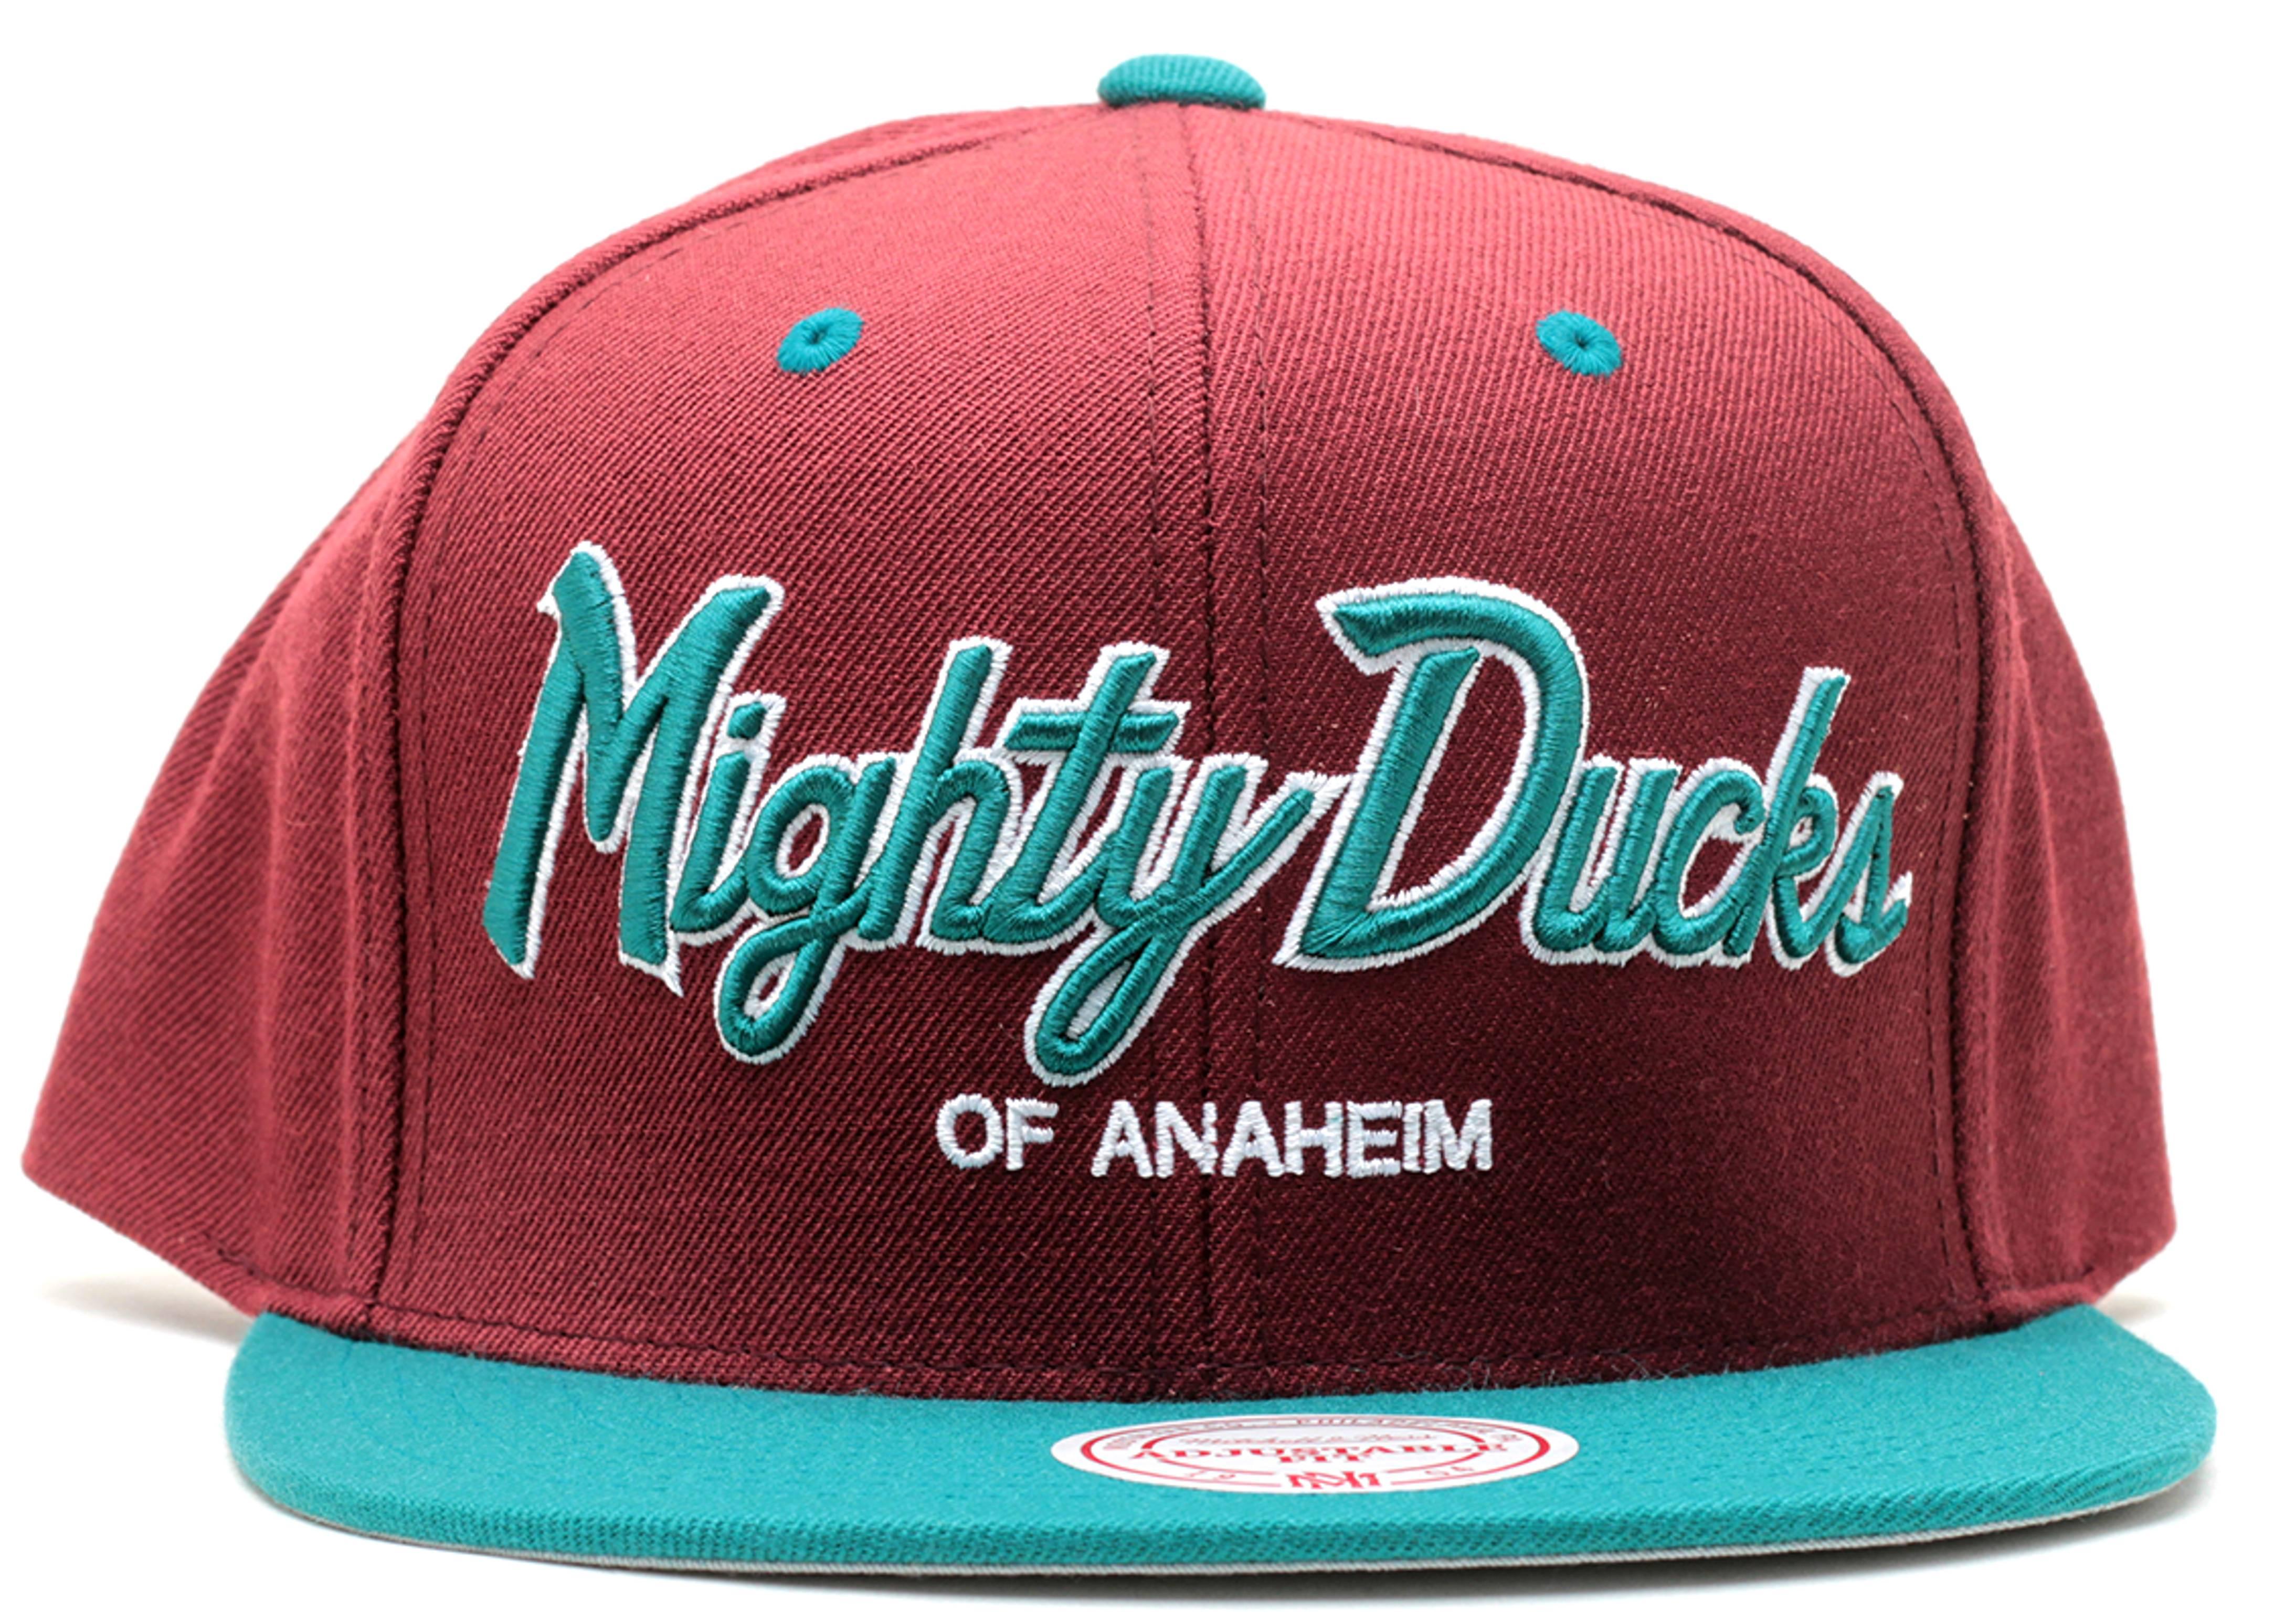 anaheim mighty ducks snap-back